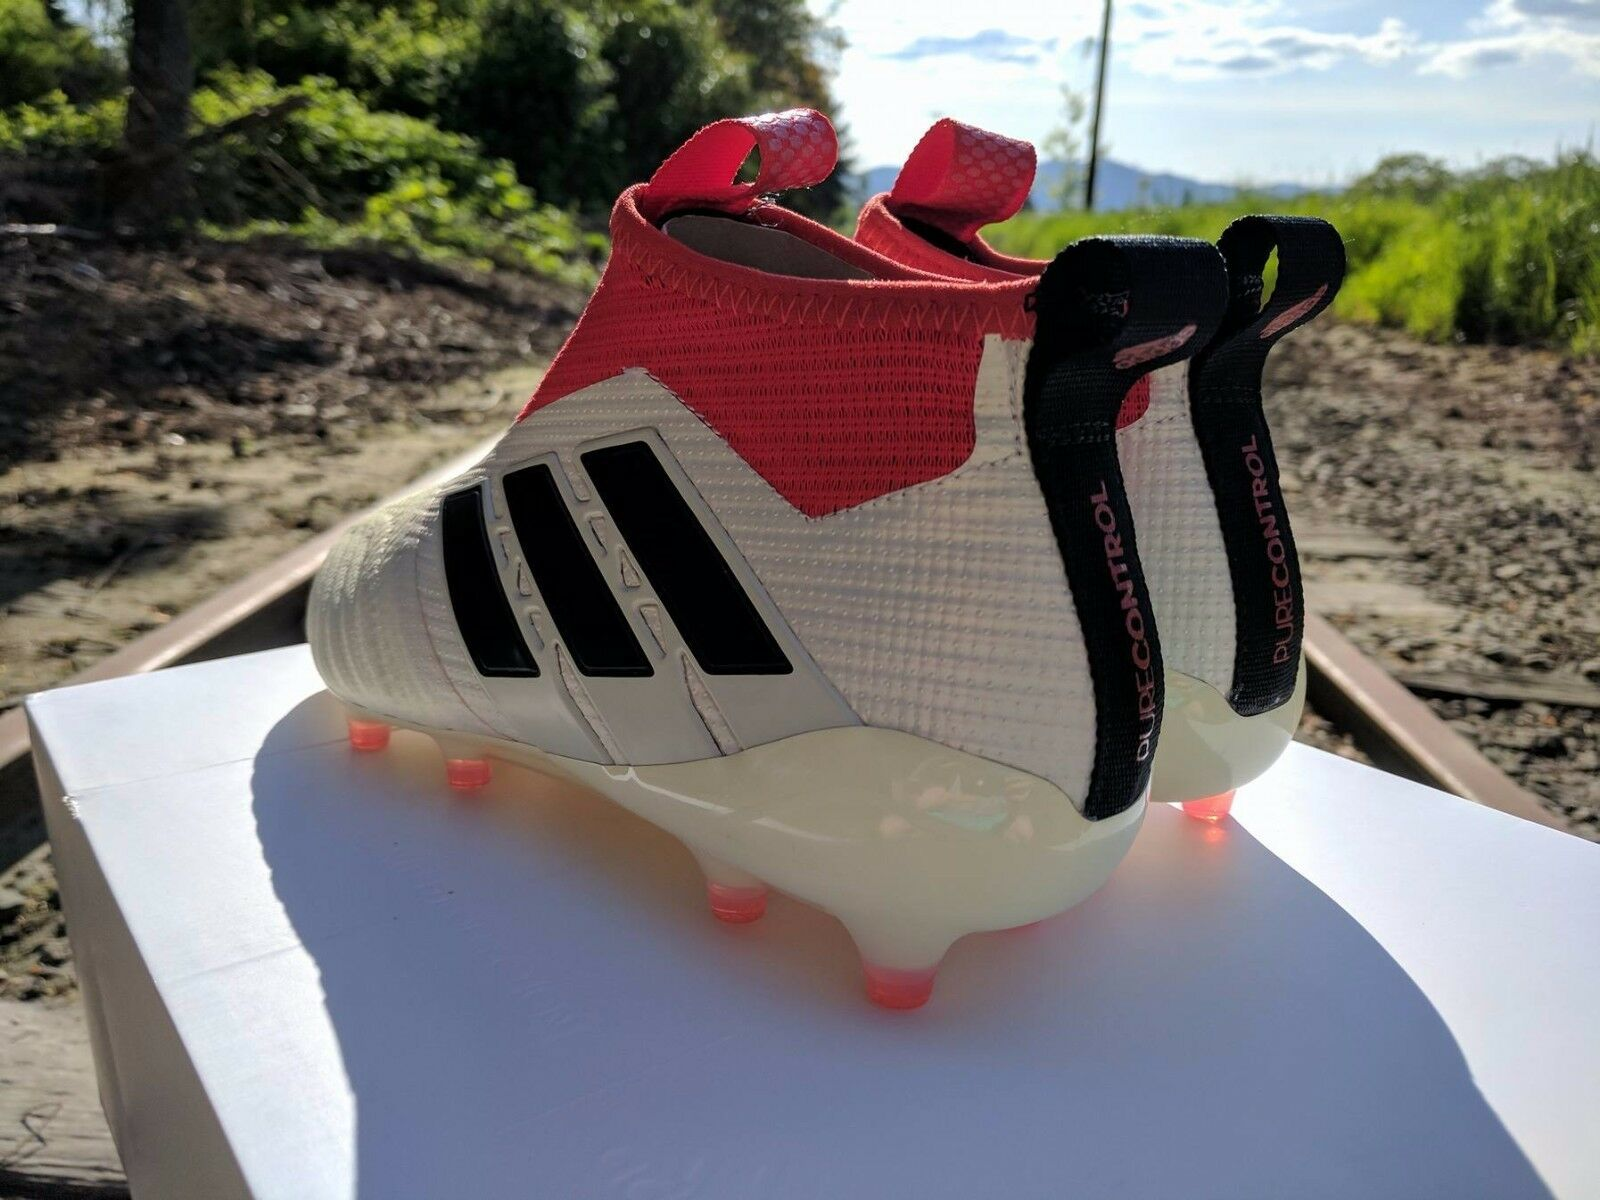 Adidas ace 17 + purecontrol champagne terra ferma le scarpe ba7599 7 - 12